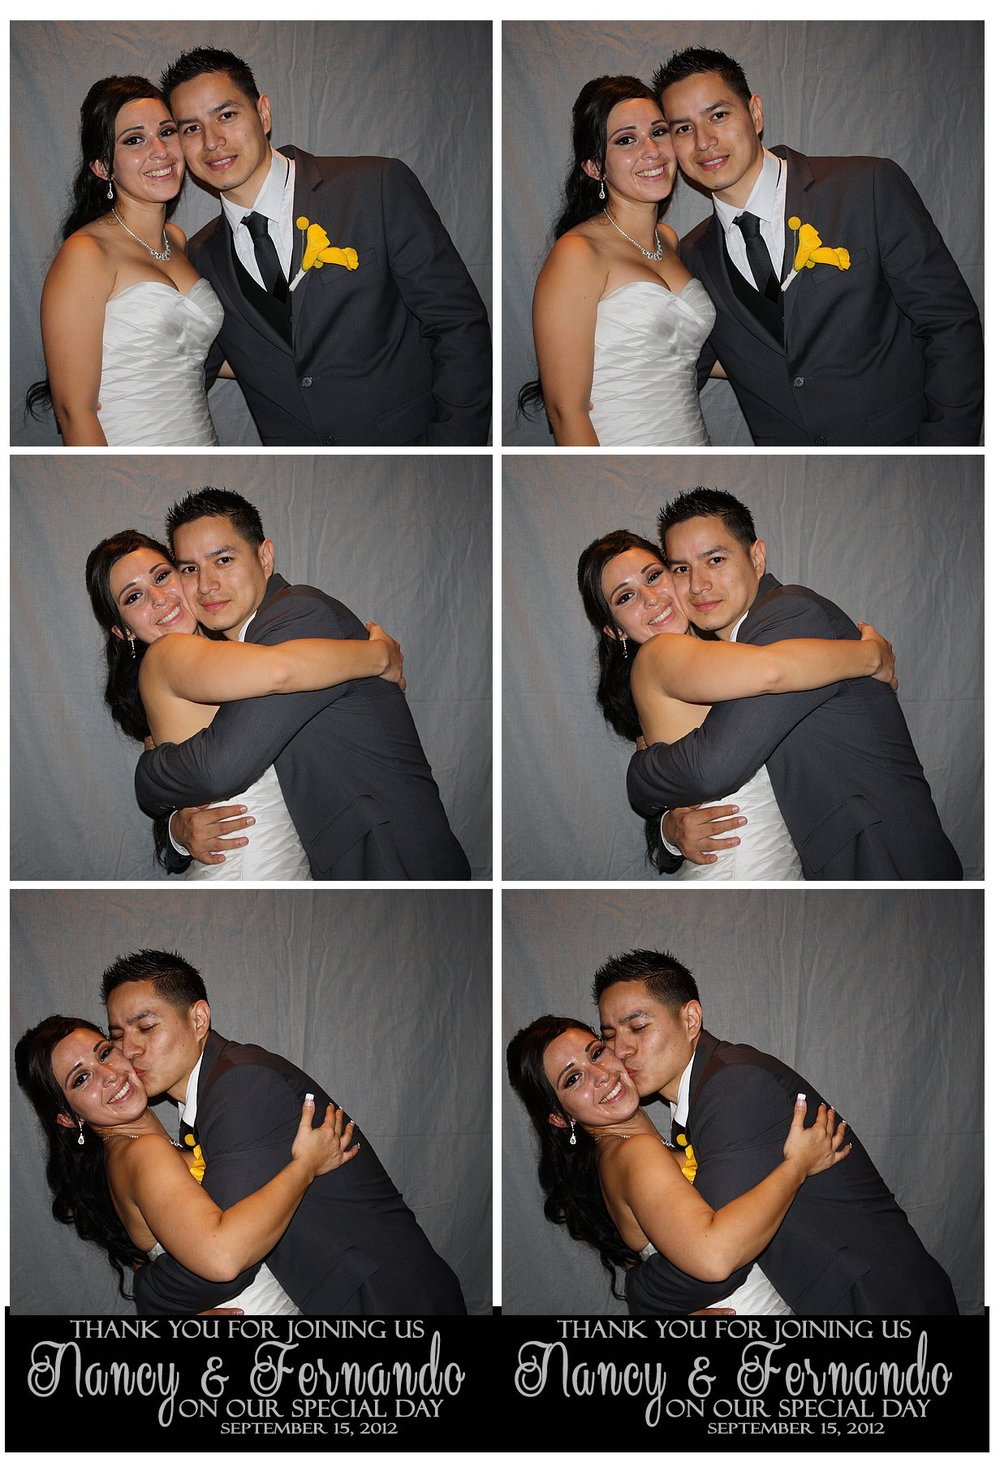 Congratulations to Nancy & Fernando!